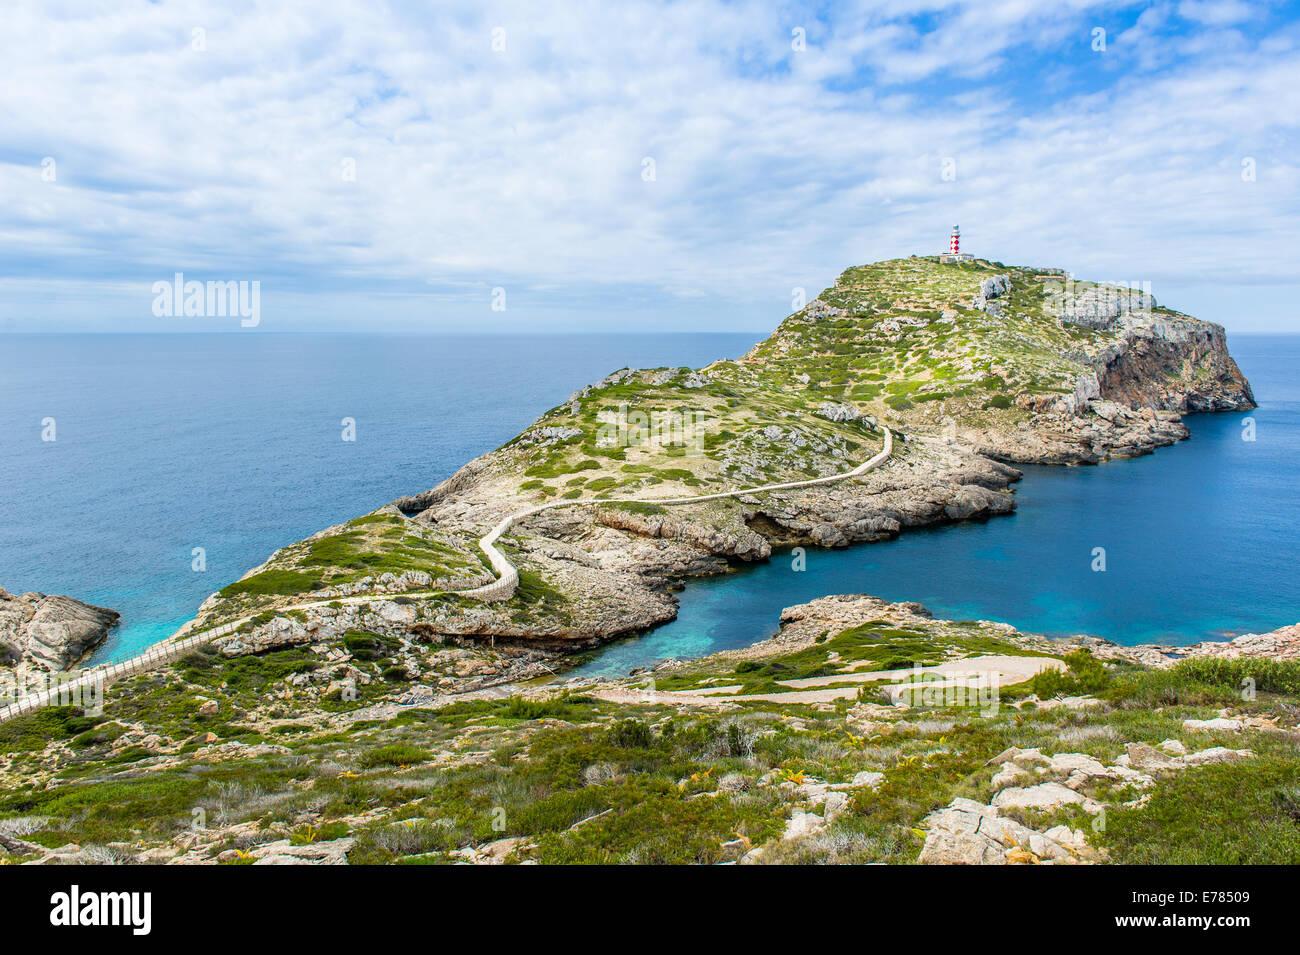 Lighthouse on Cabrera island landscpae - Stock Image